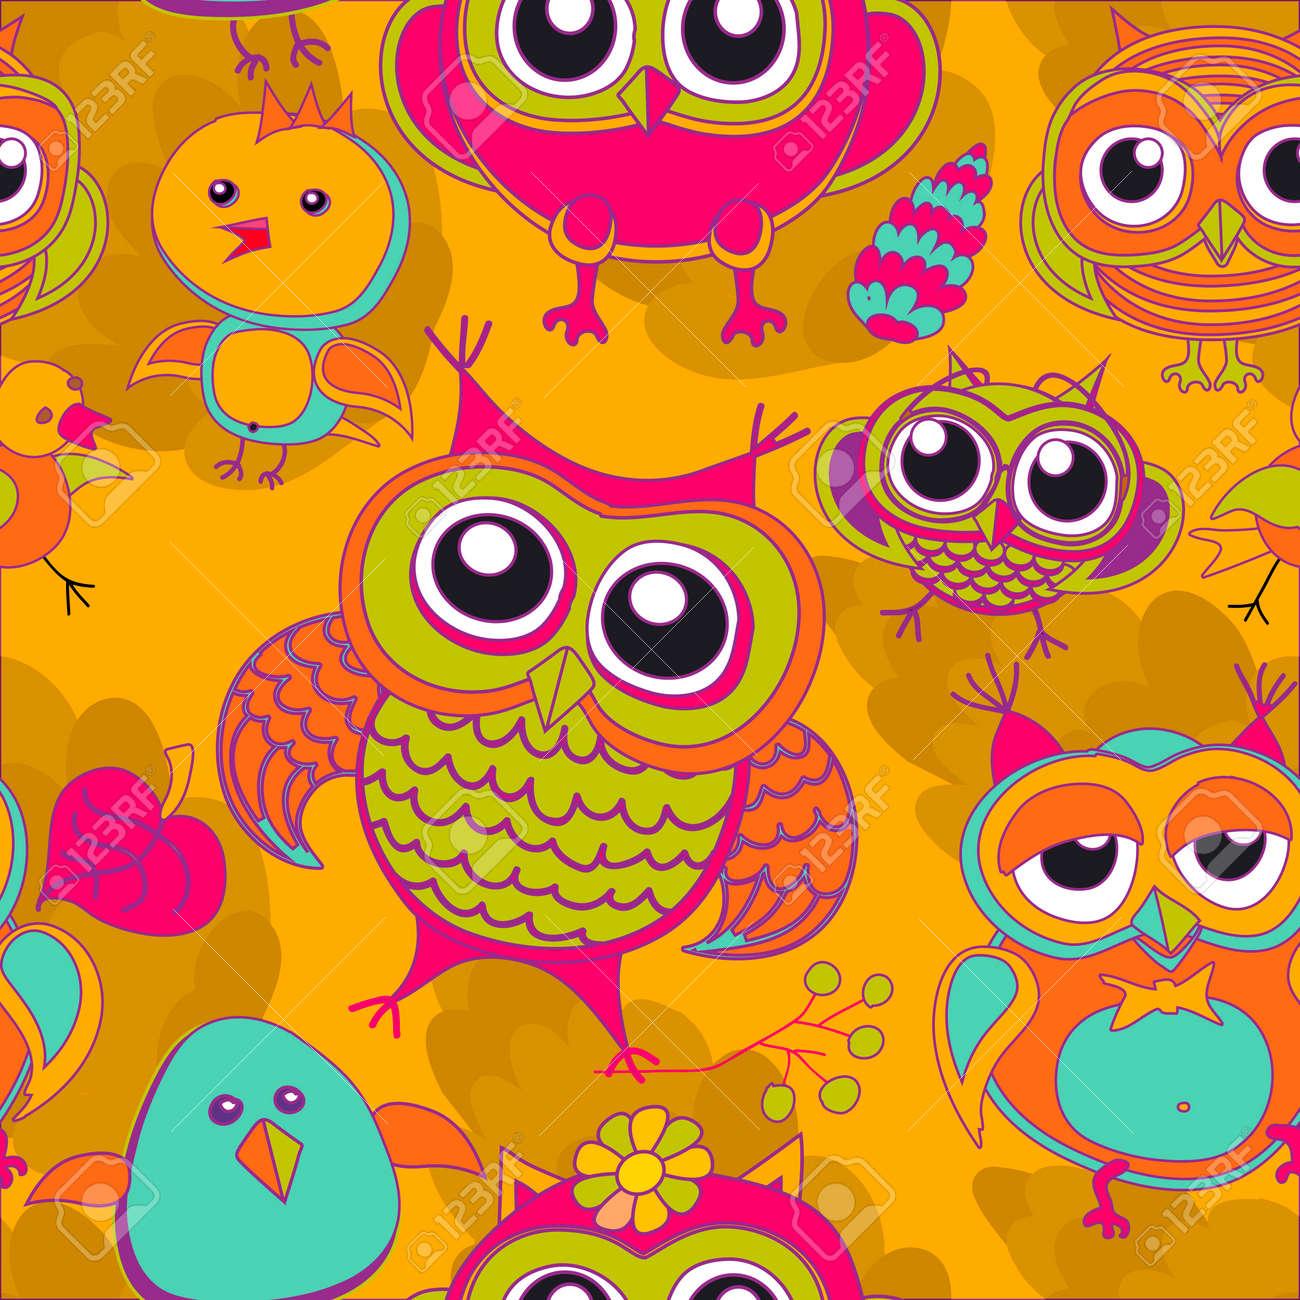 Hibou Oiseau Rose Arbre Animal Feuille Dessin Illustration